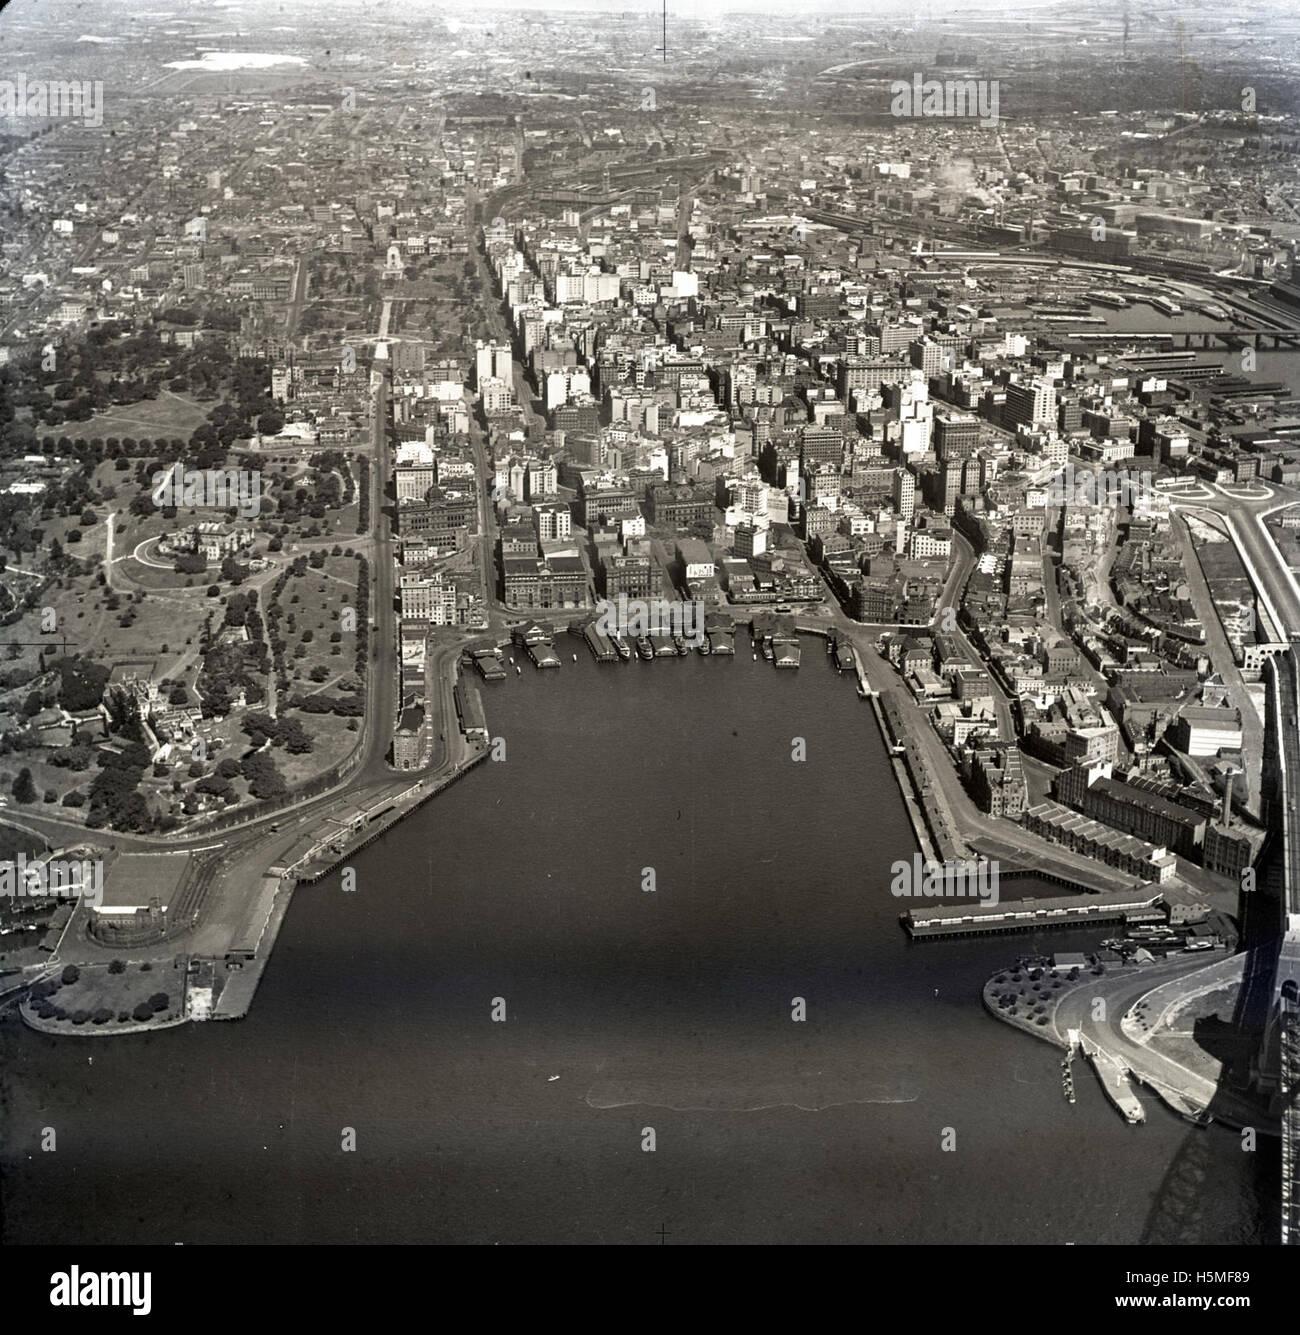 Circular Quay - 29th Sept 1935 - Stock Image